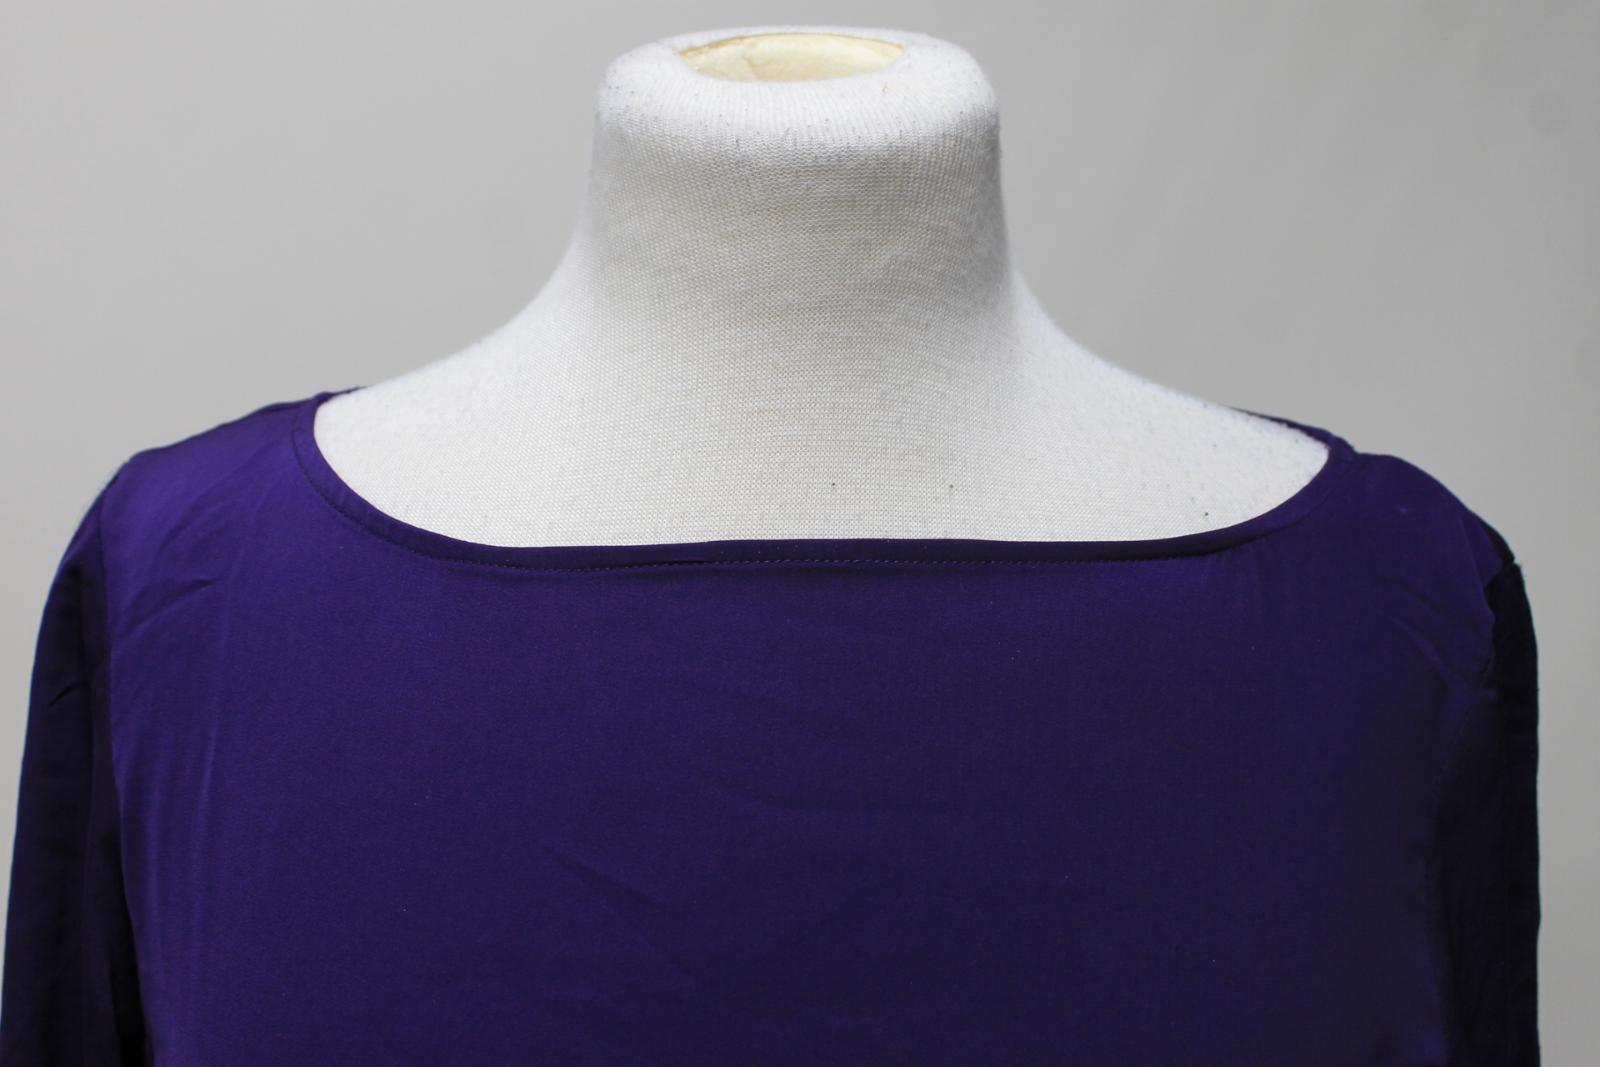 LAUREN-BY-RALPH-LAUREN-Ladies-Purple-Satin-Pleated-Sleeve-Round-Neck-Top-S thumbnail 7